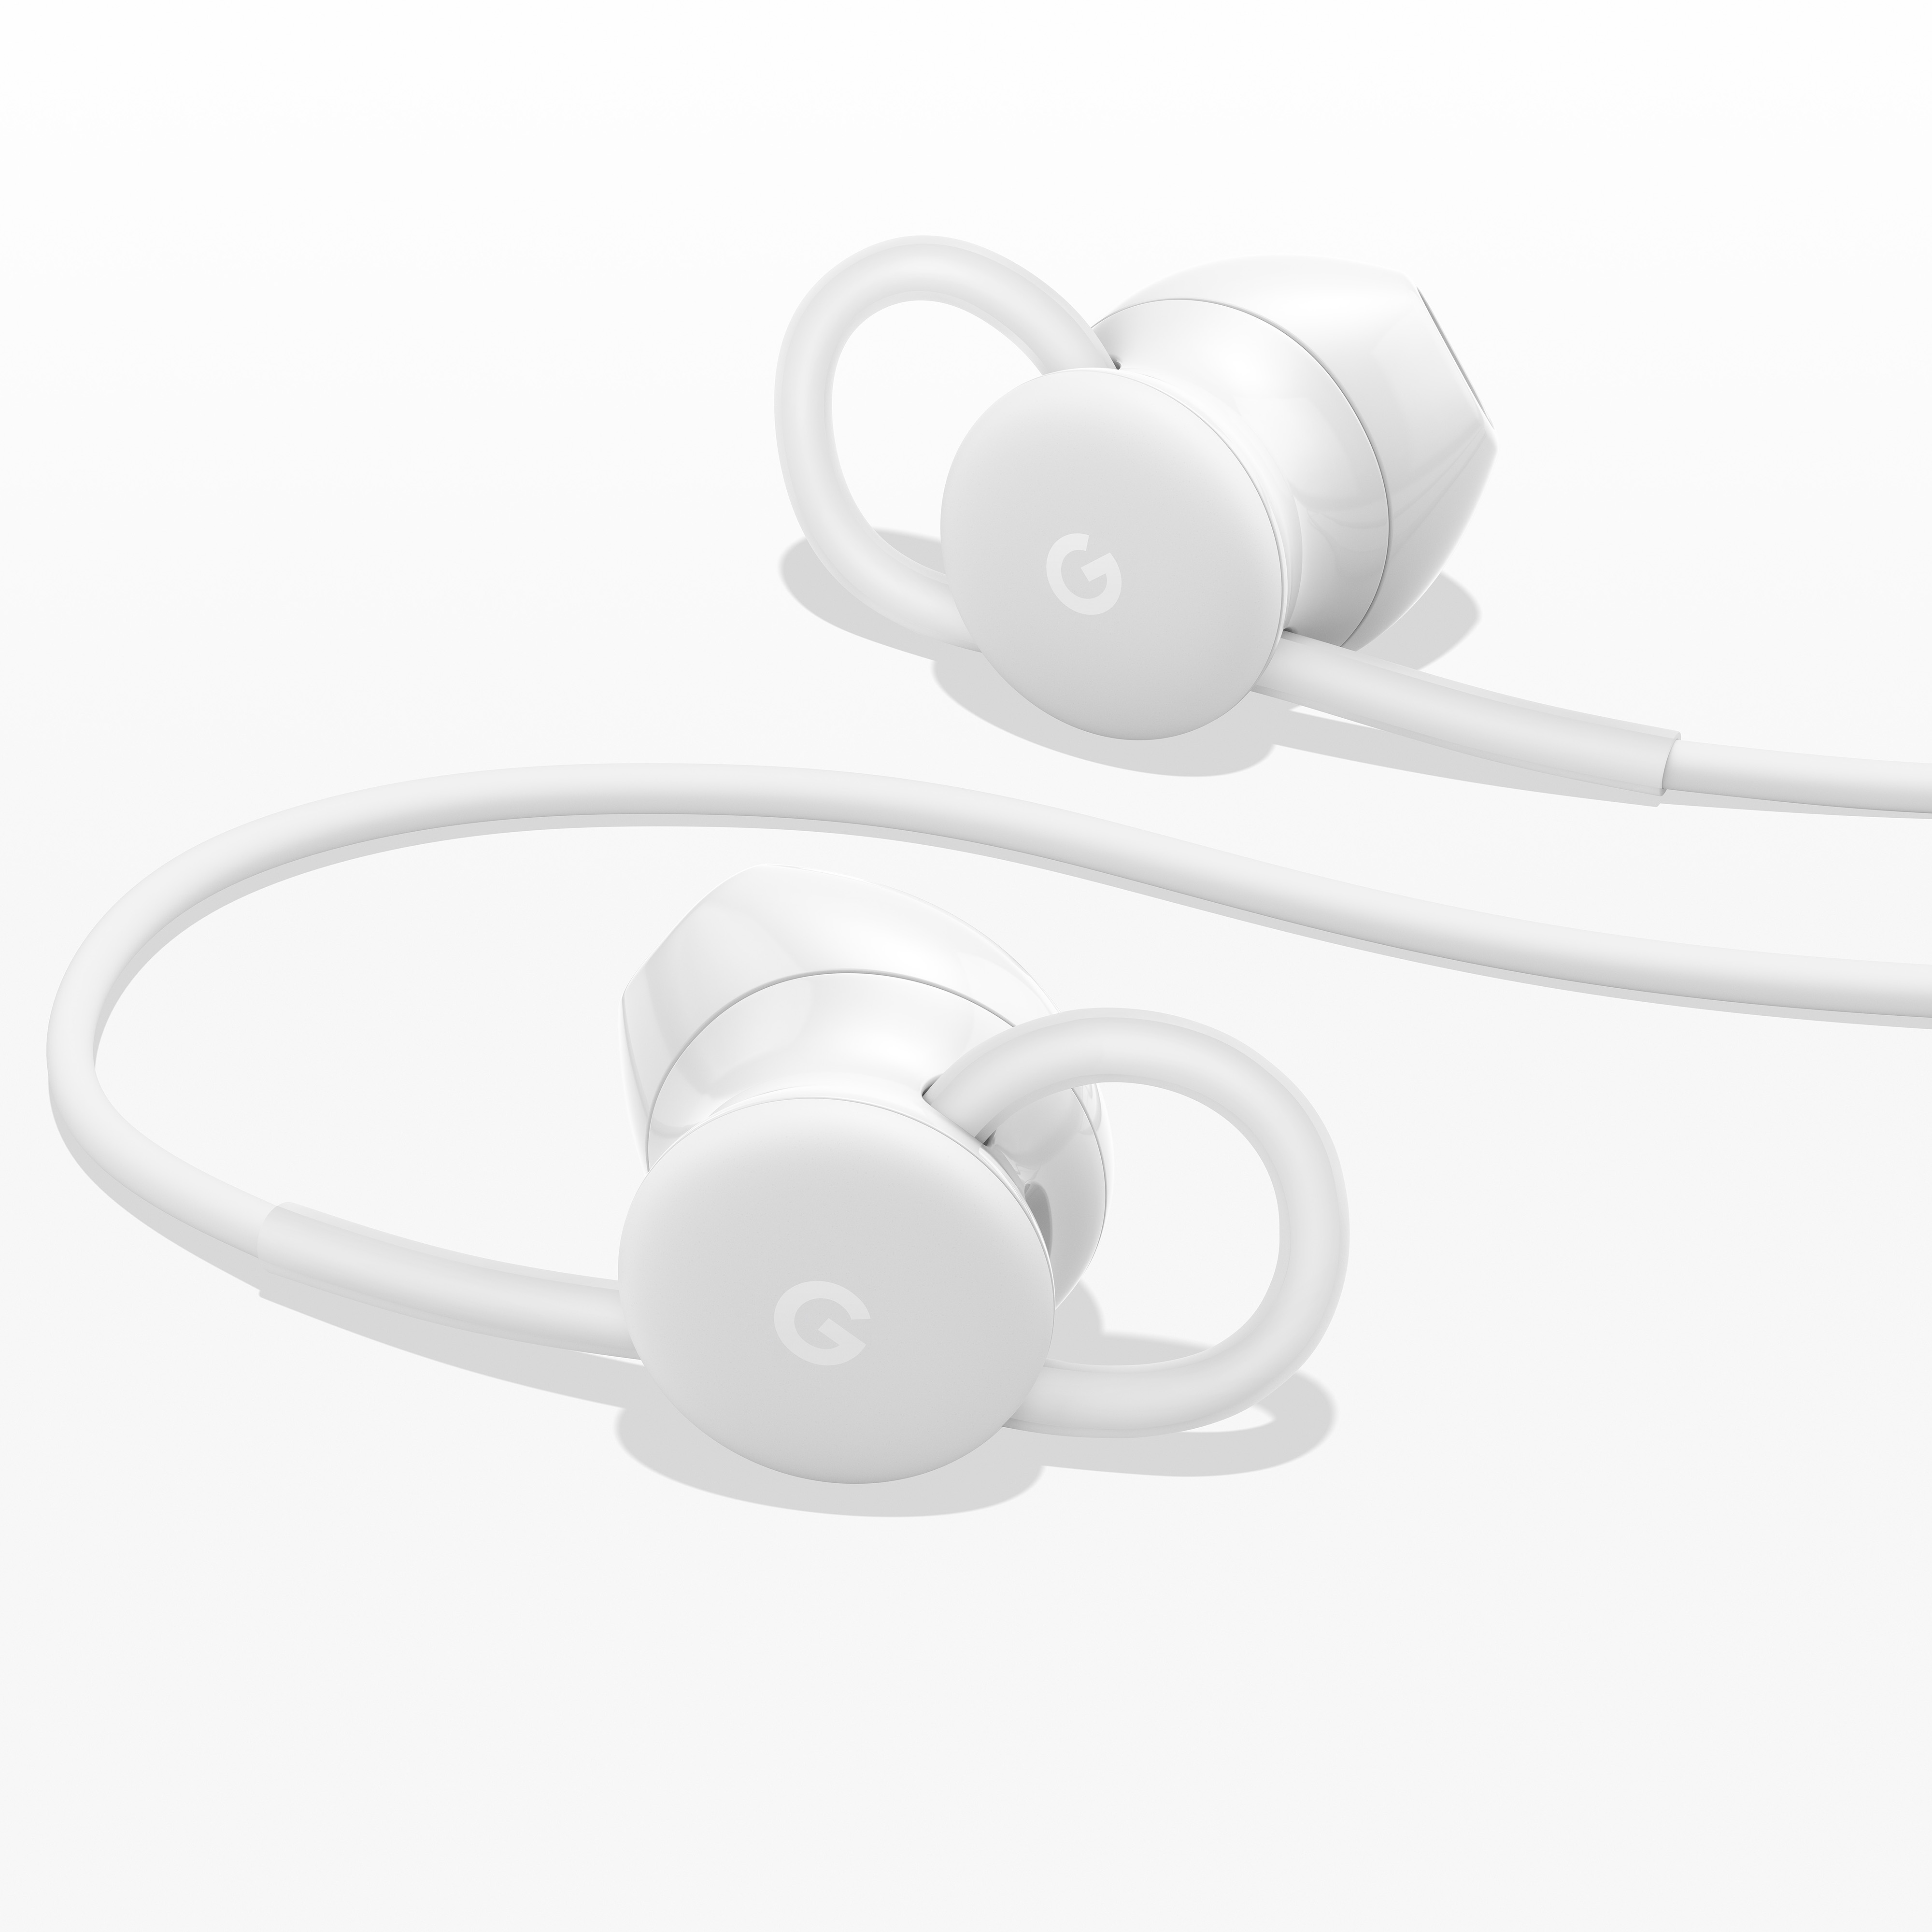 16de4805fcd Google Pixel USB-C Earbuds Review | Digital Trends